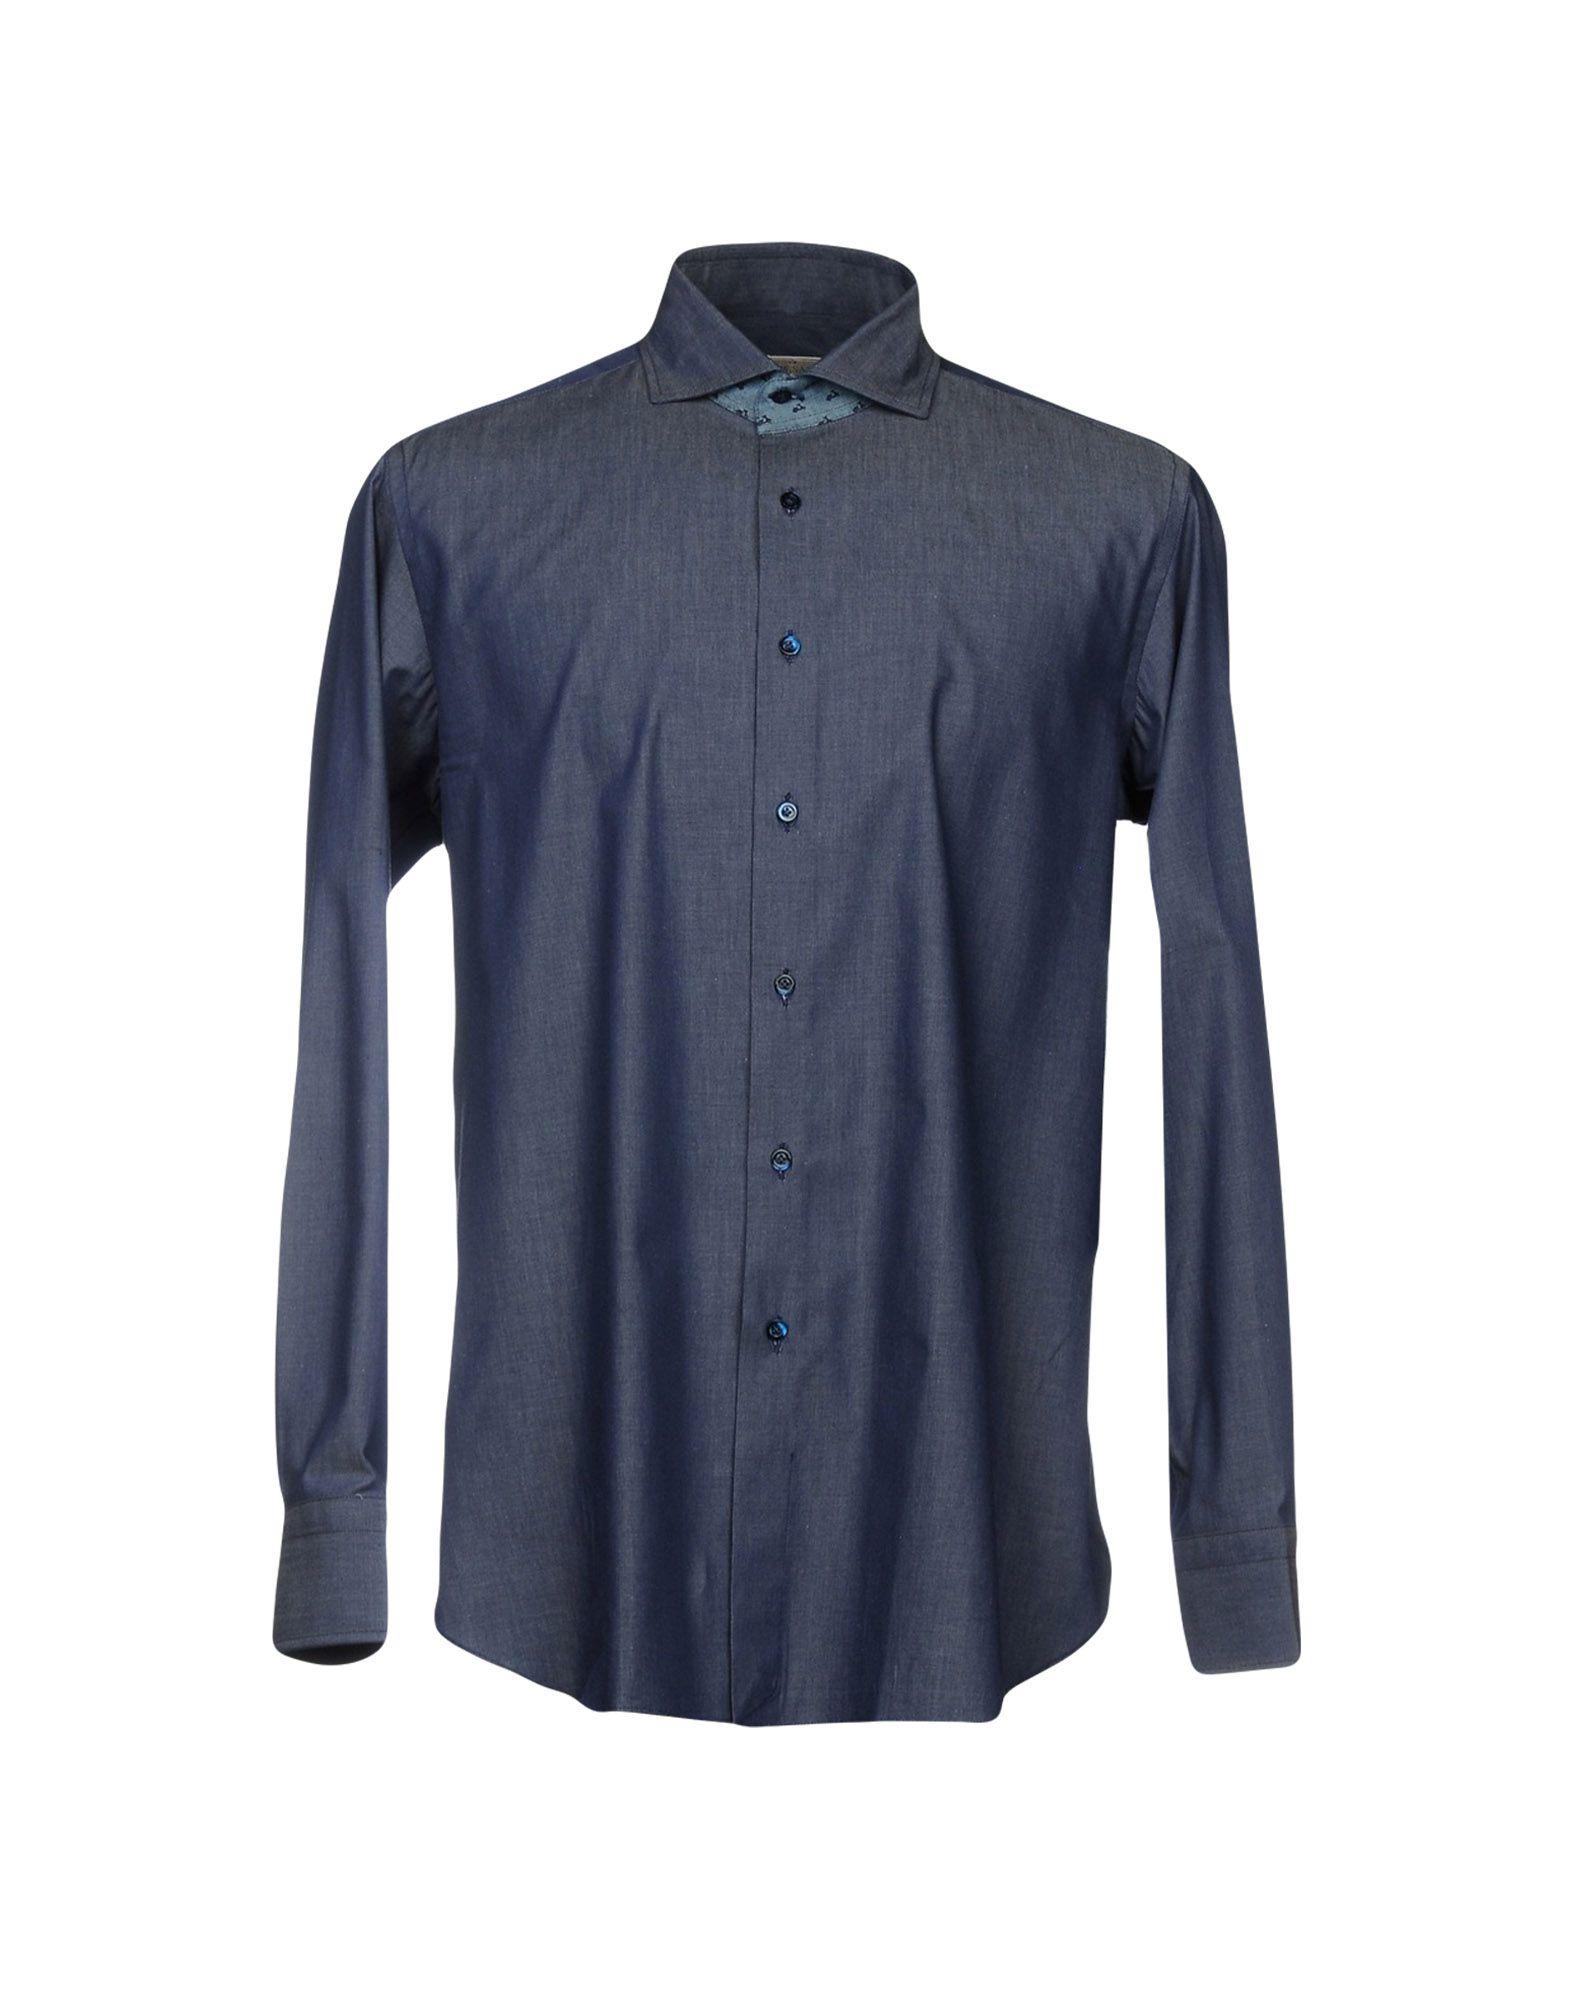 J.W. SAX Milano Джинсовая рубашка j w sax milano кардиган